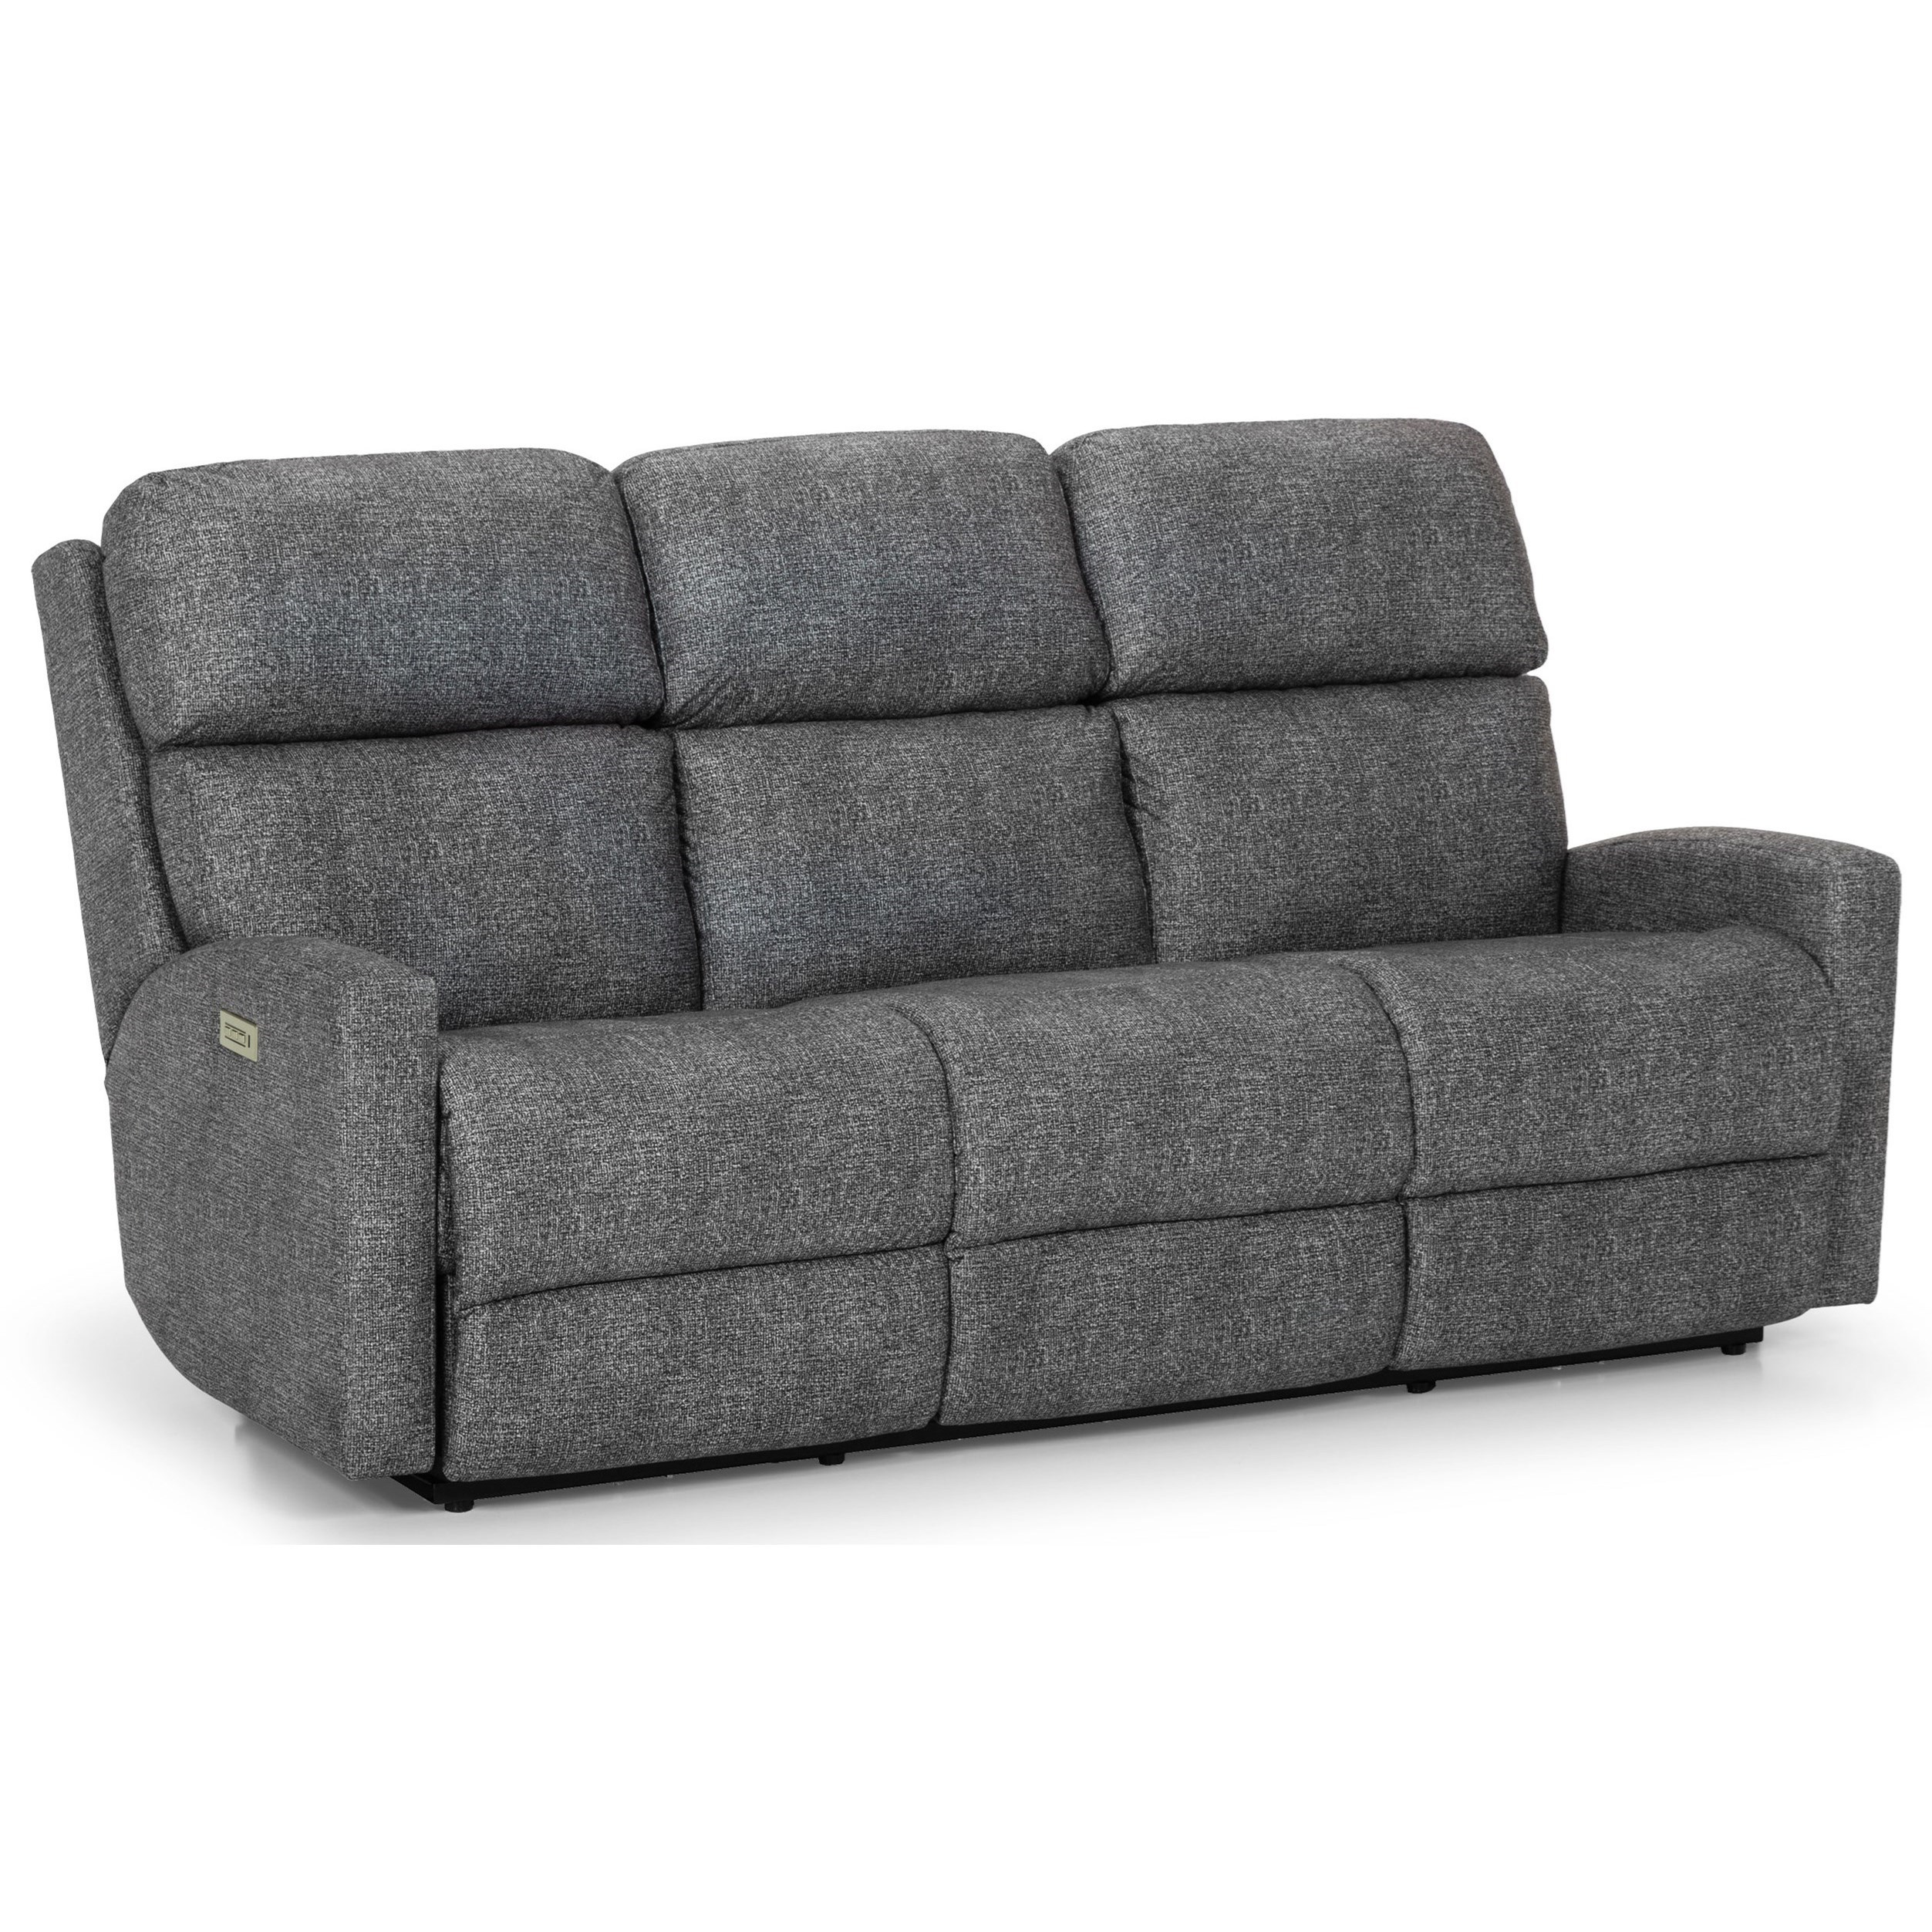 Fine Stanton 857 Contemporary Power Reclining Sofa With Power Interior Design Ideas Clesiryabchikinfo